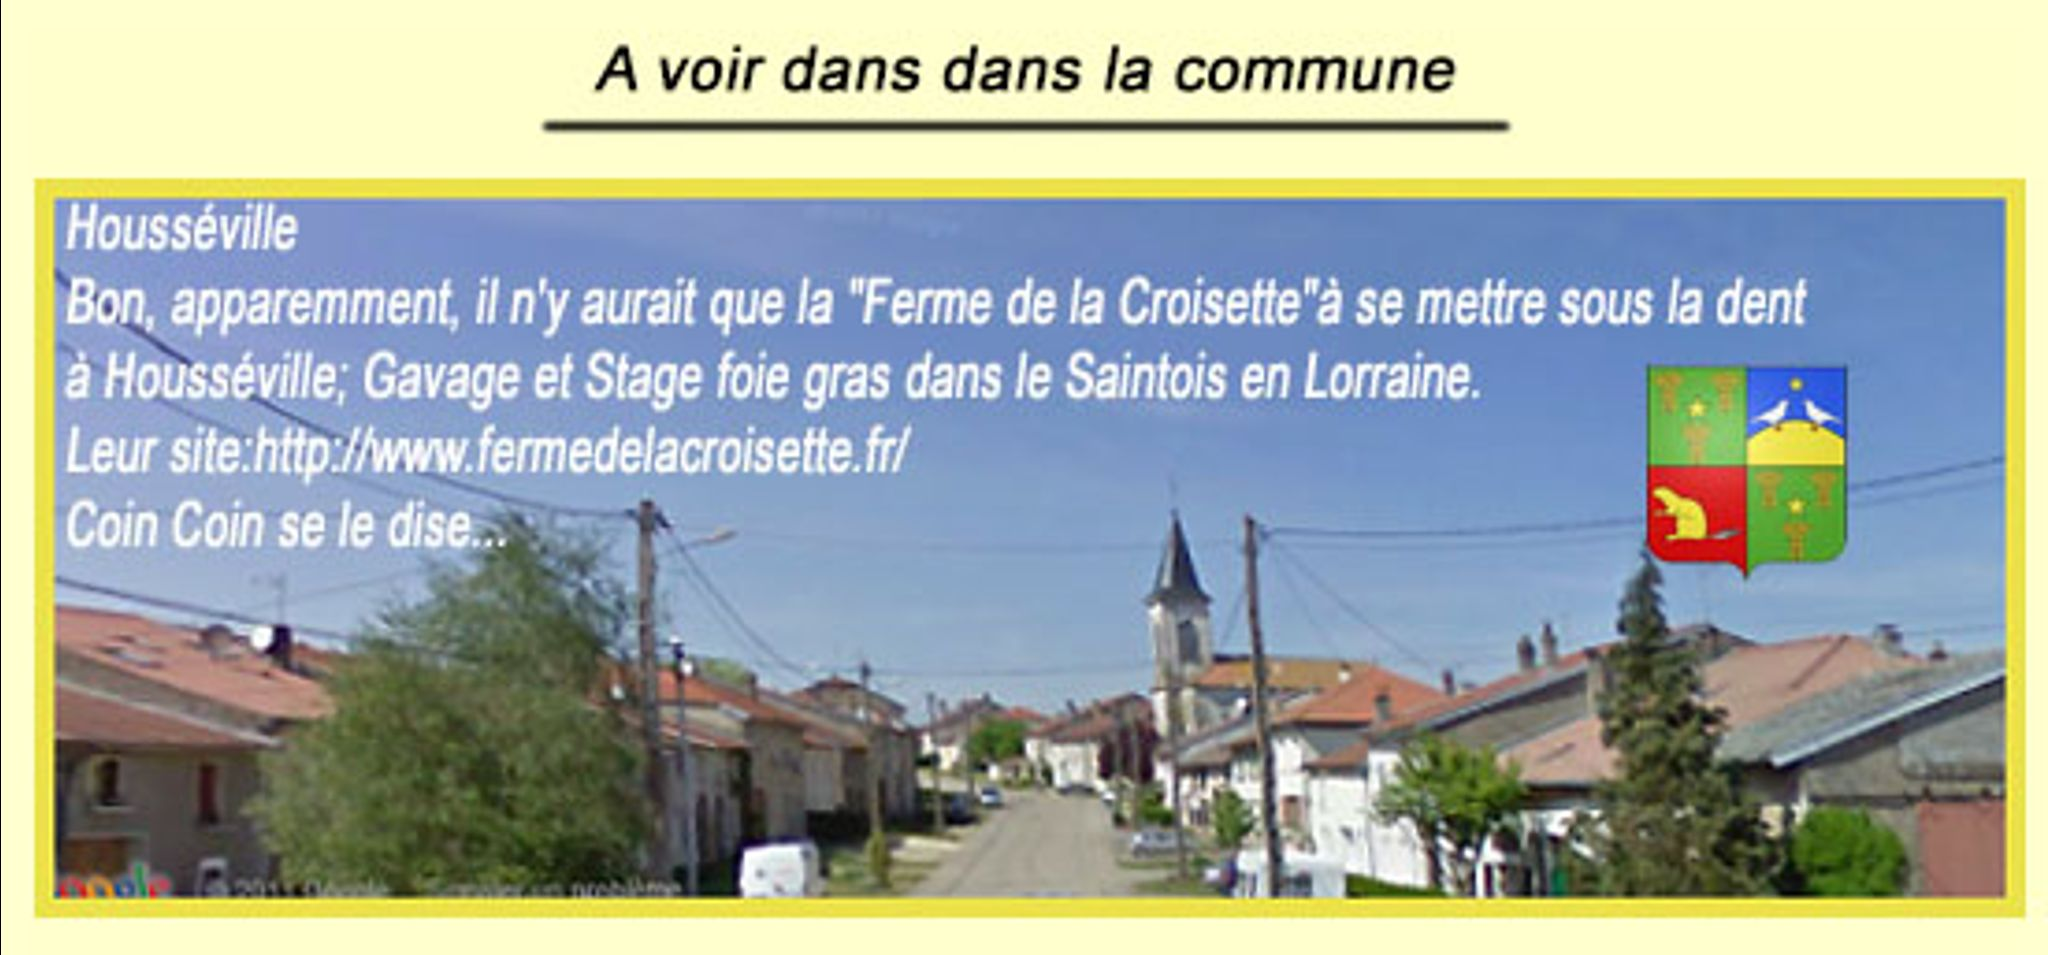 Trail Other Activity At Nancy Grand Est Ligne 14 Nancy